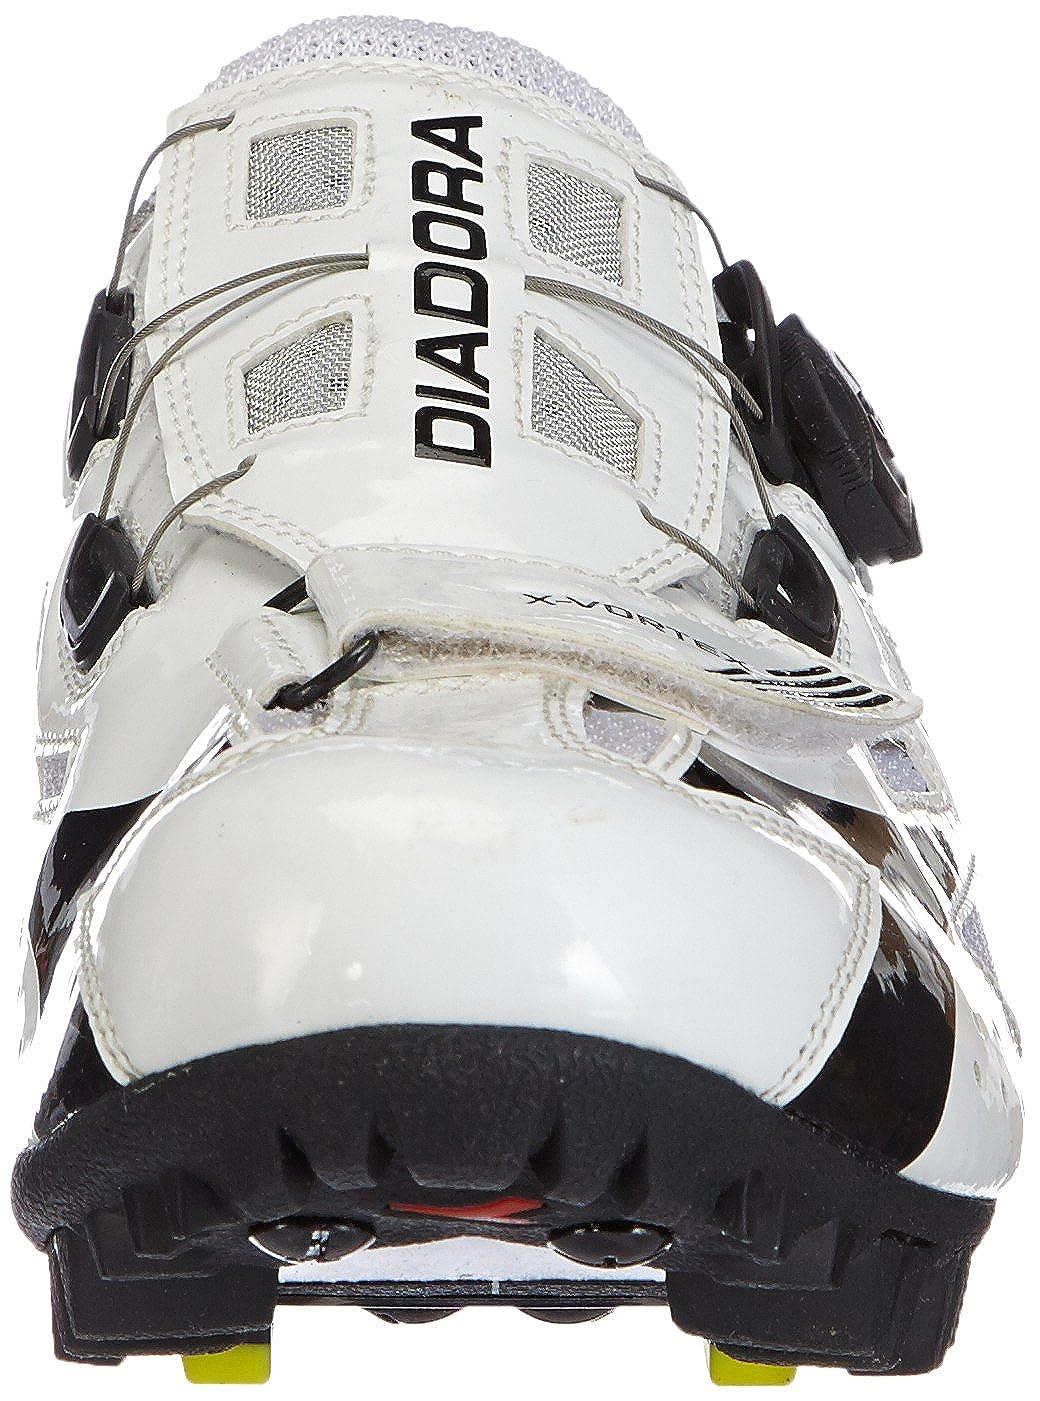 Diadora Diadora Diadora X- Vortex Unisex-Erwachsene Radsportschuhe - Mountainbike d4b735